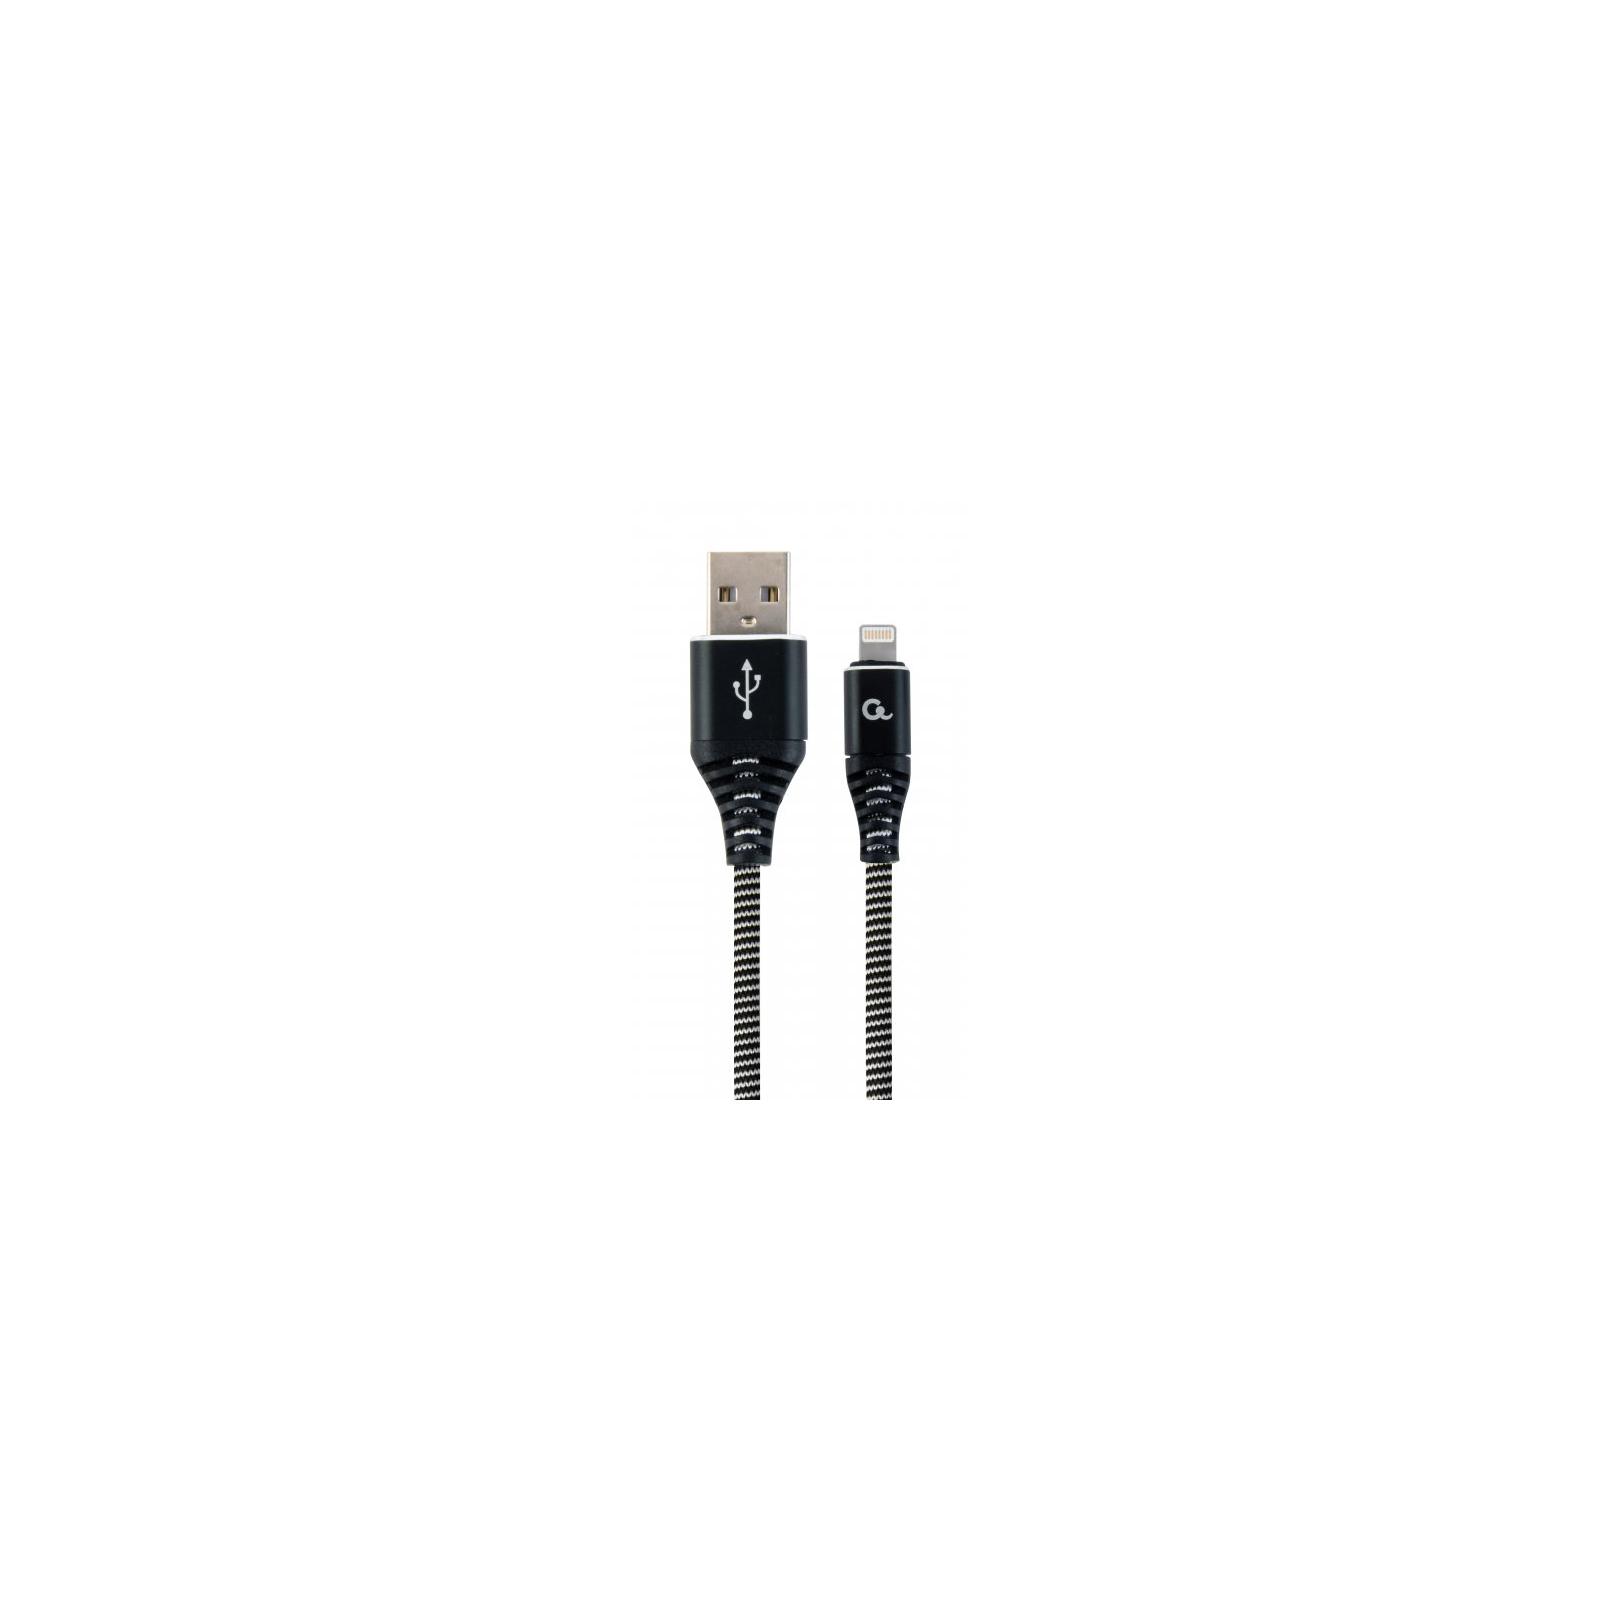 Дата кабель USB 2.0 AM to Lightning 1.0m Cablexpert (CC-USB2B-AMLM-1M-BW)